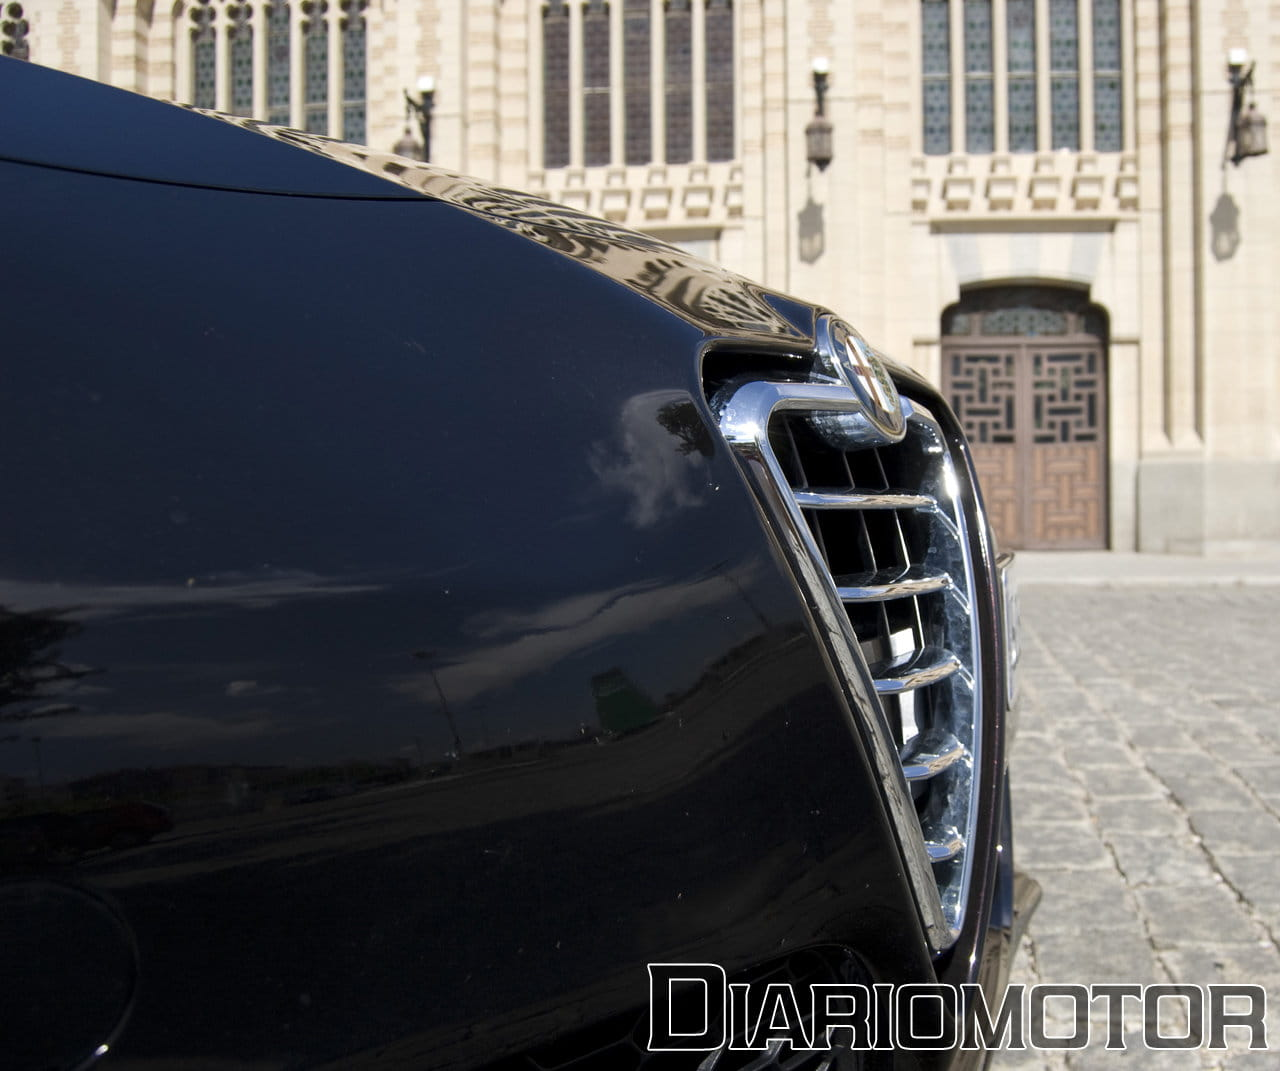 alfa romeo giulietta 1 4 turbo multiair 170 cv distinctive a prueba i foto 18 de 38. Black Bedroom Furniture Sets. Home Design Ideas